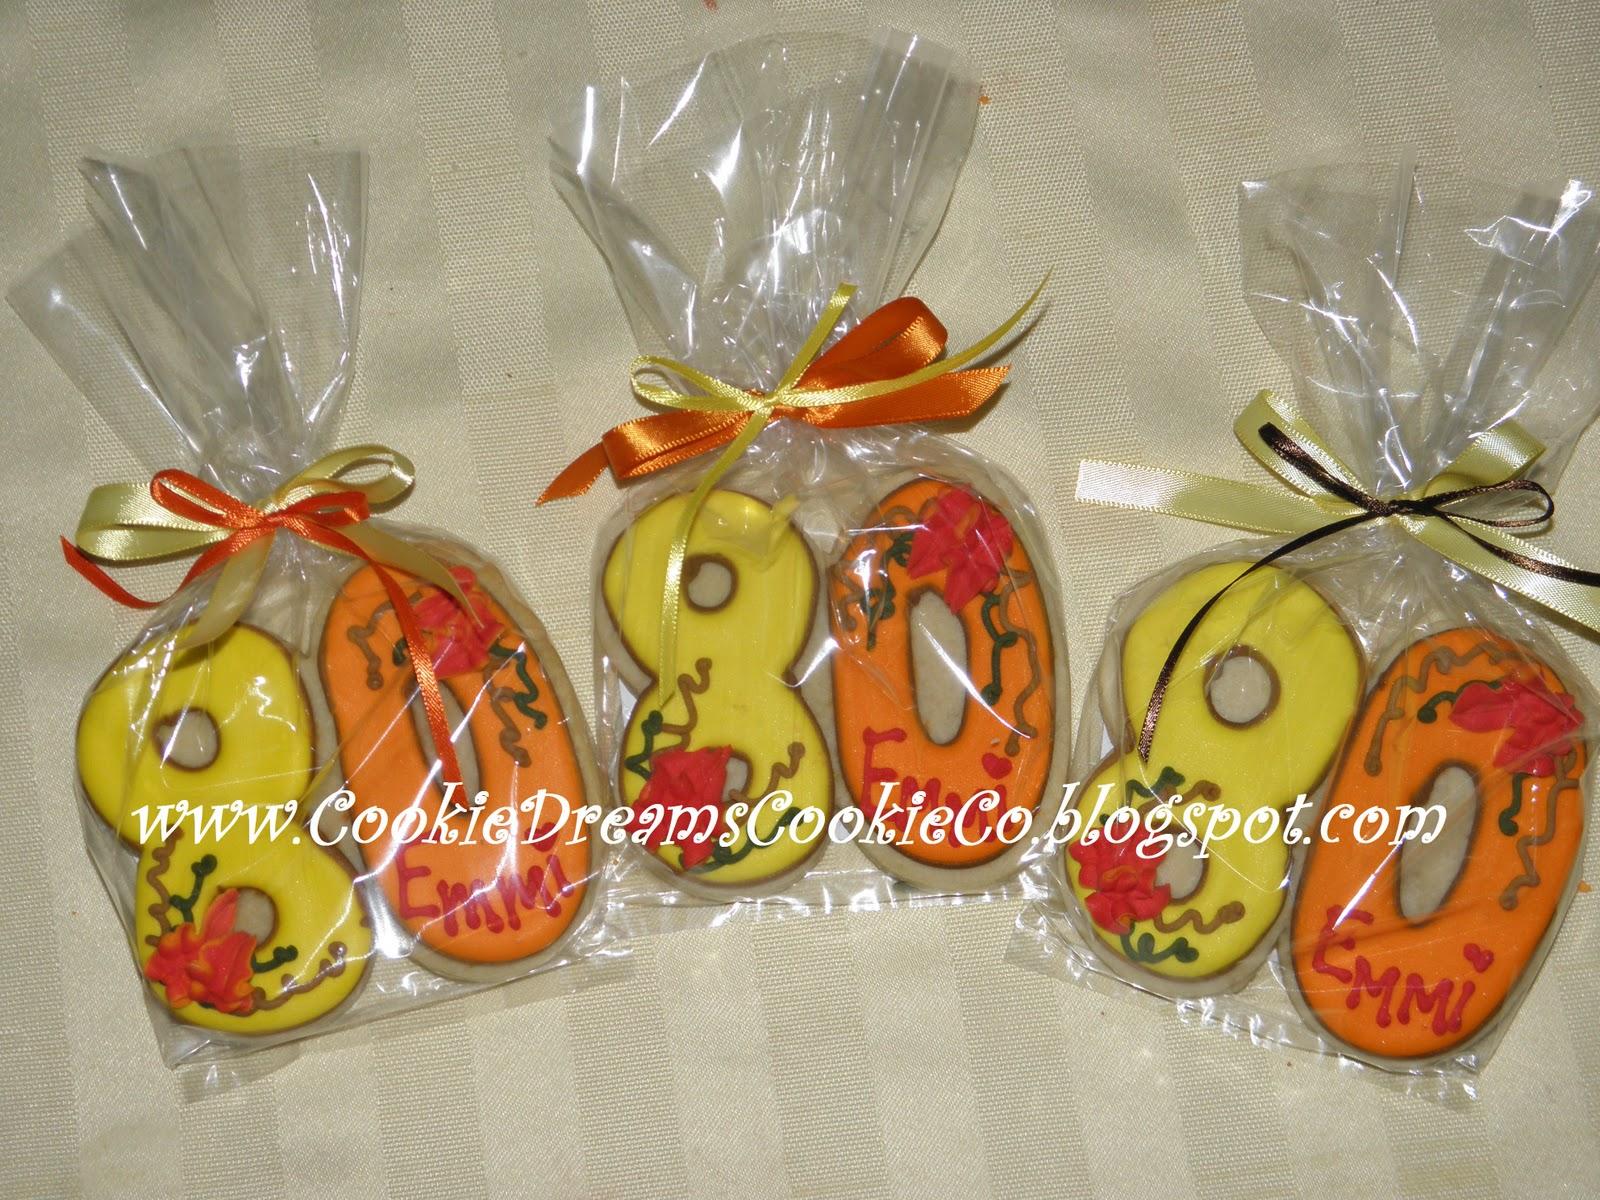 Cookie Dreams Cookie Co 80th Birthday Cookies